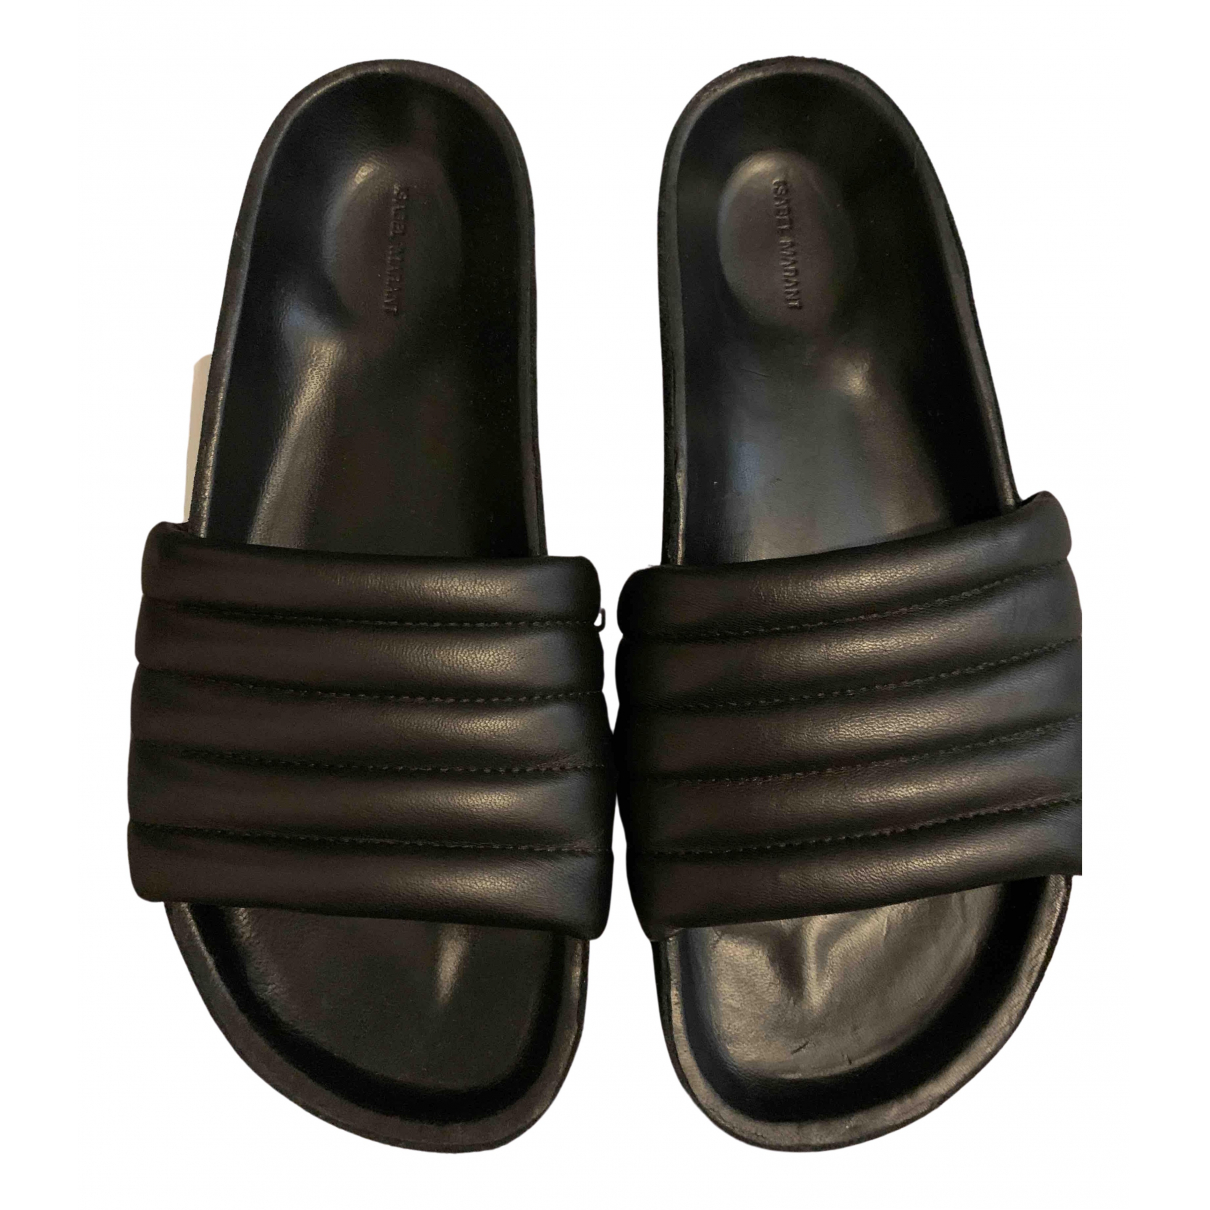 Isabel Marant \N Black Leather Sandals for Women 36 EU